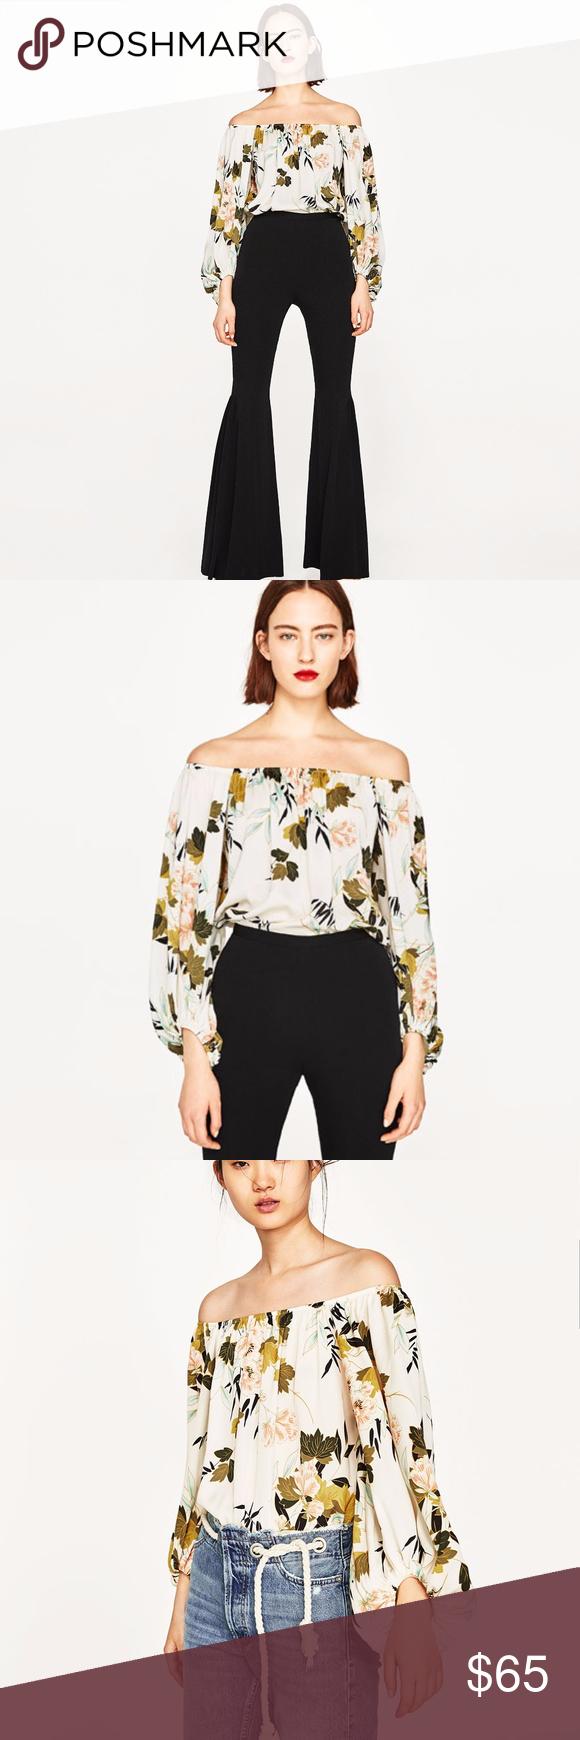 07f6454e Zara Floral Print Bodysuit M medium 5580 New with tag attached & unworn,  Authentic Zara